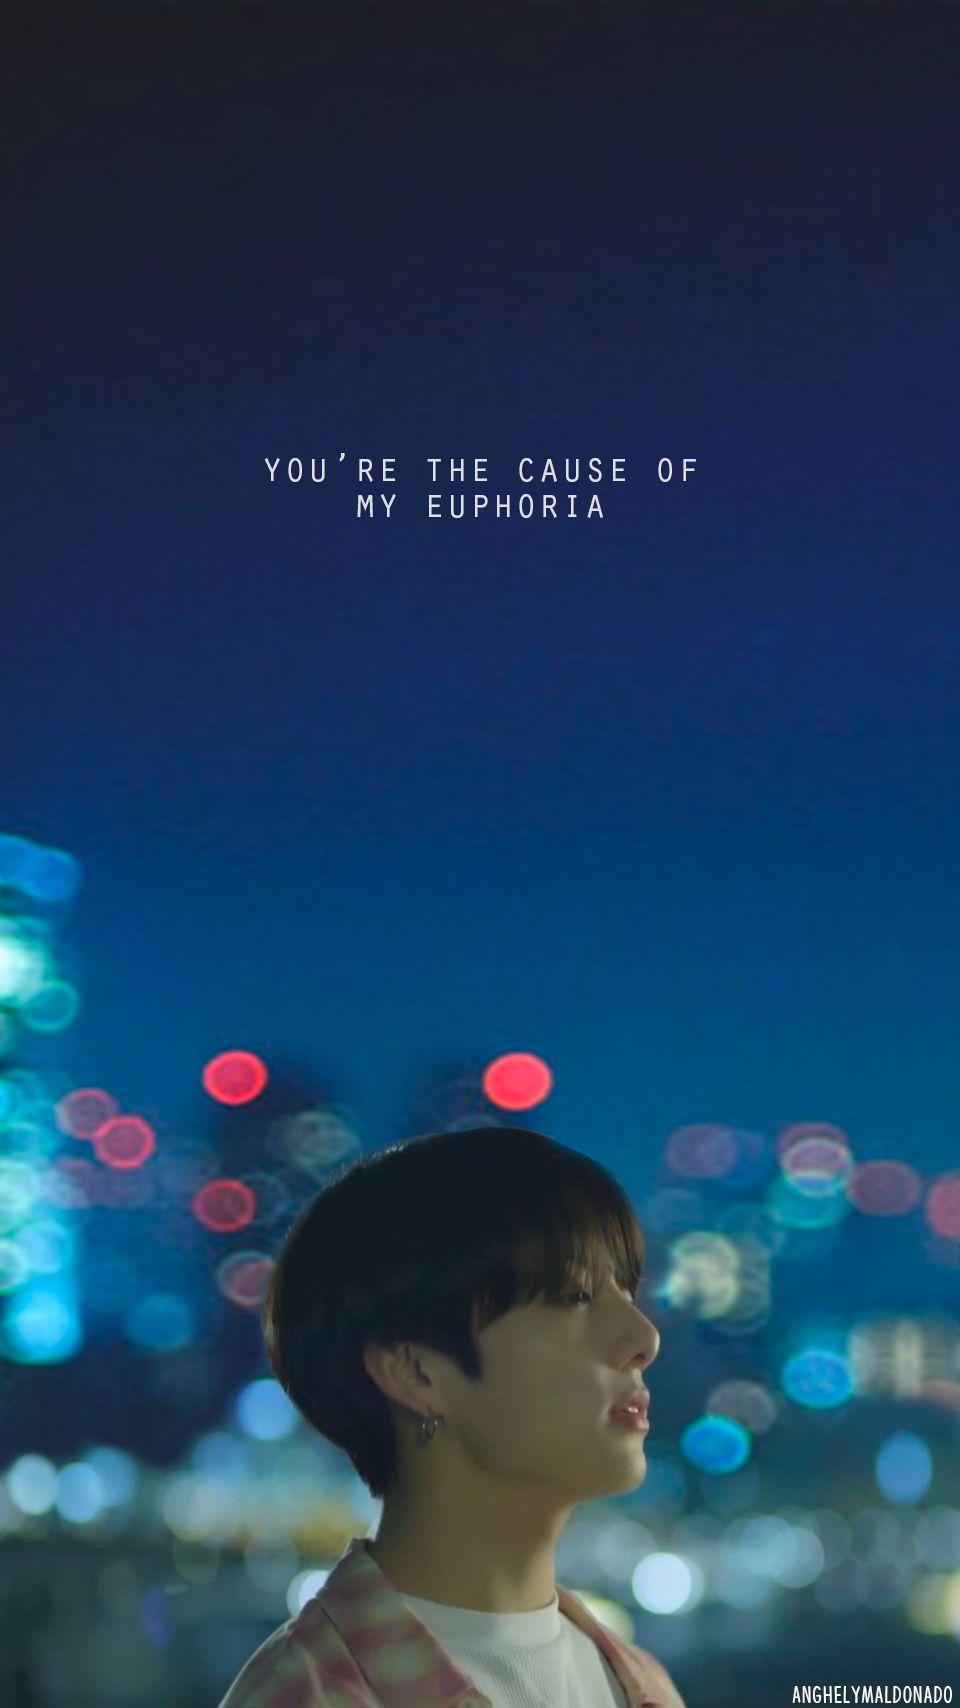 Jungkook Wallpaper Euphoria Lyrics Bts walpaper Bts